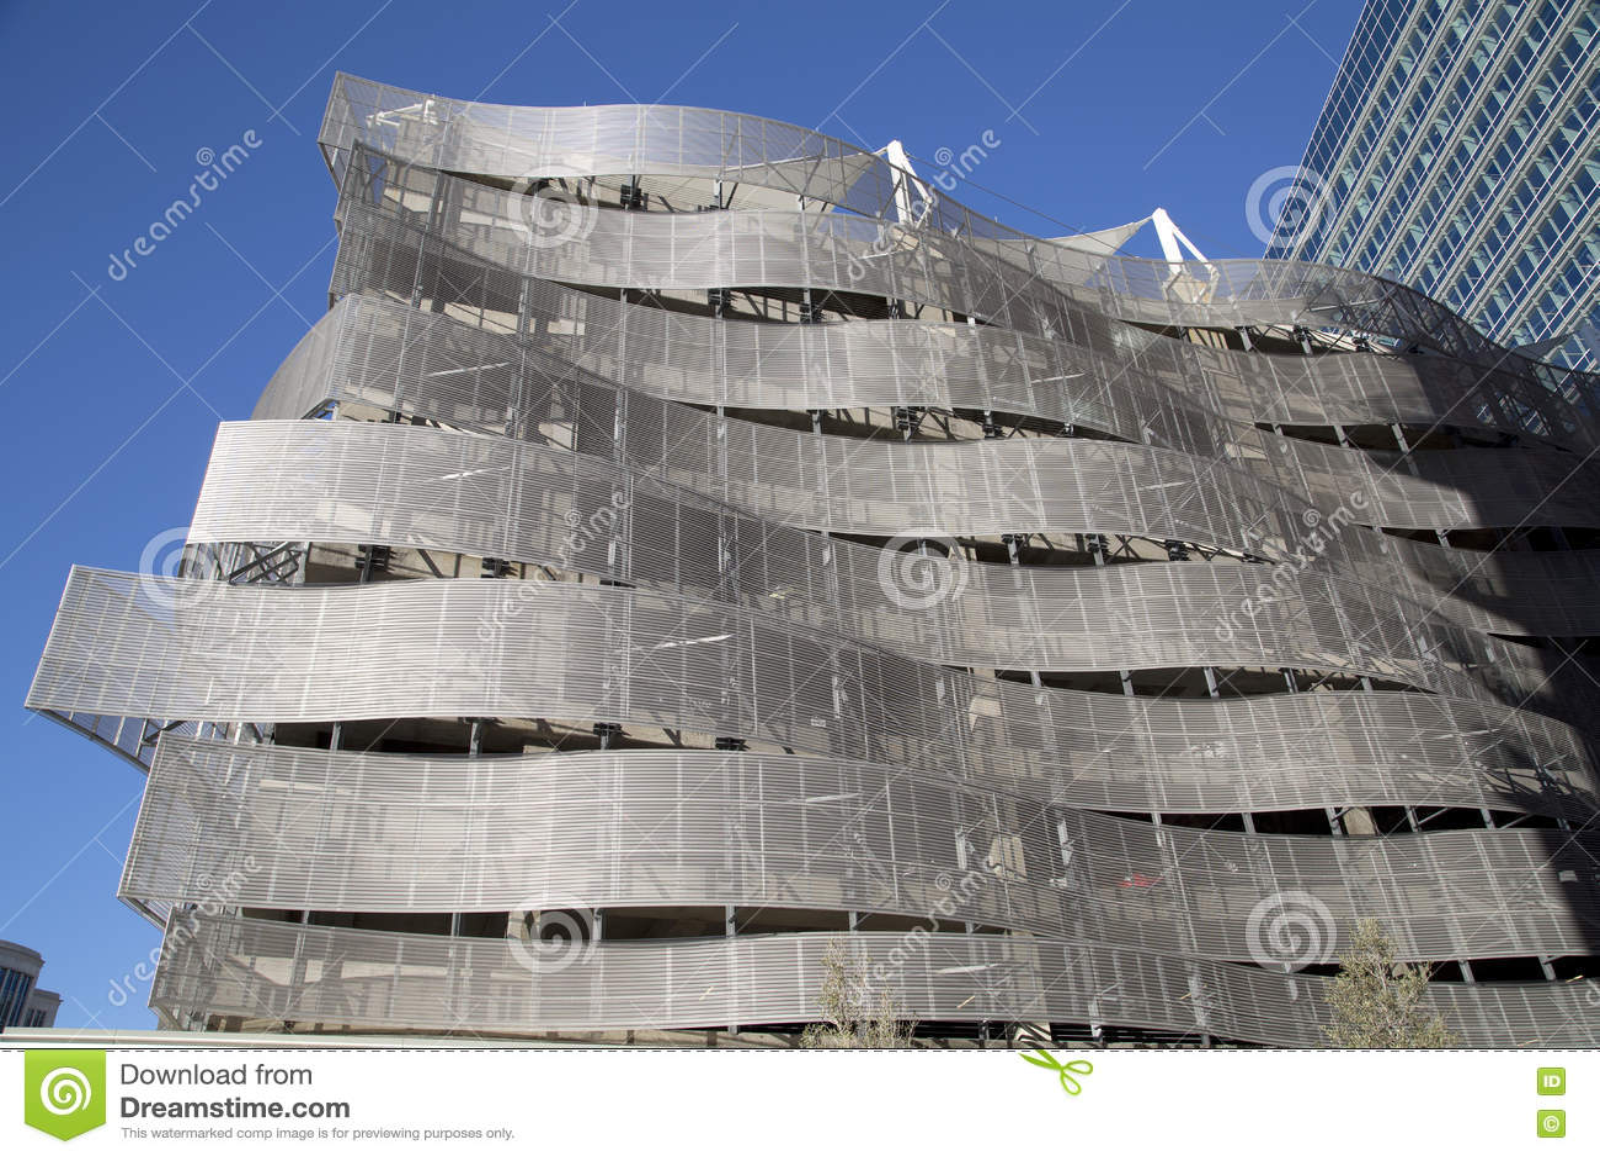 Metal garage exterior in the city